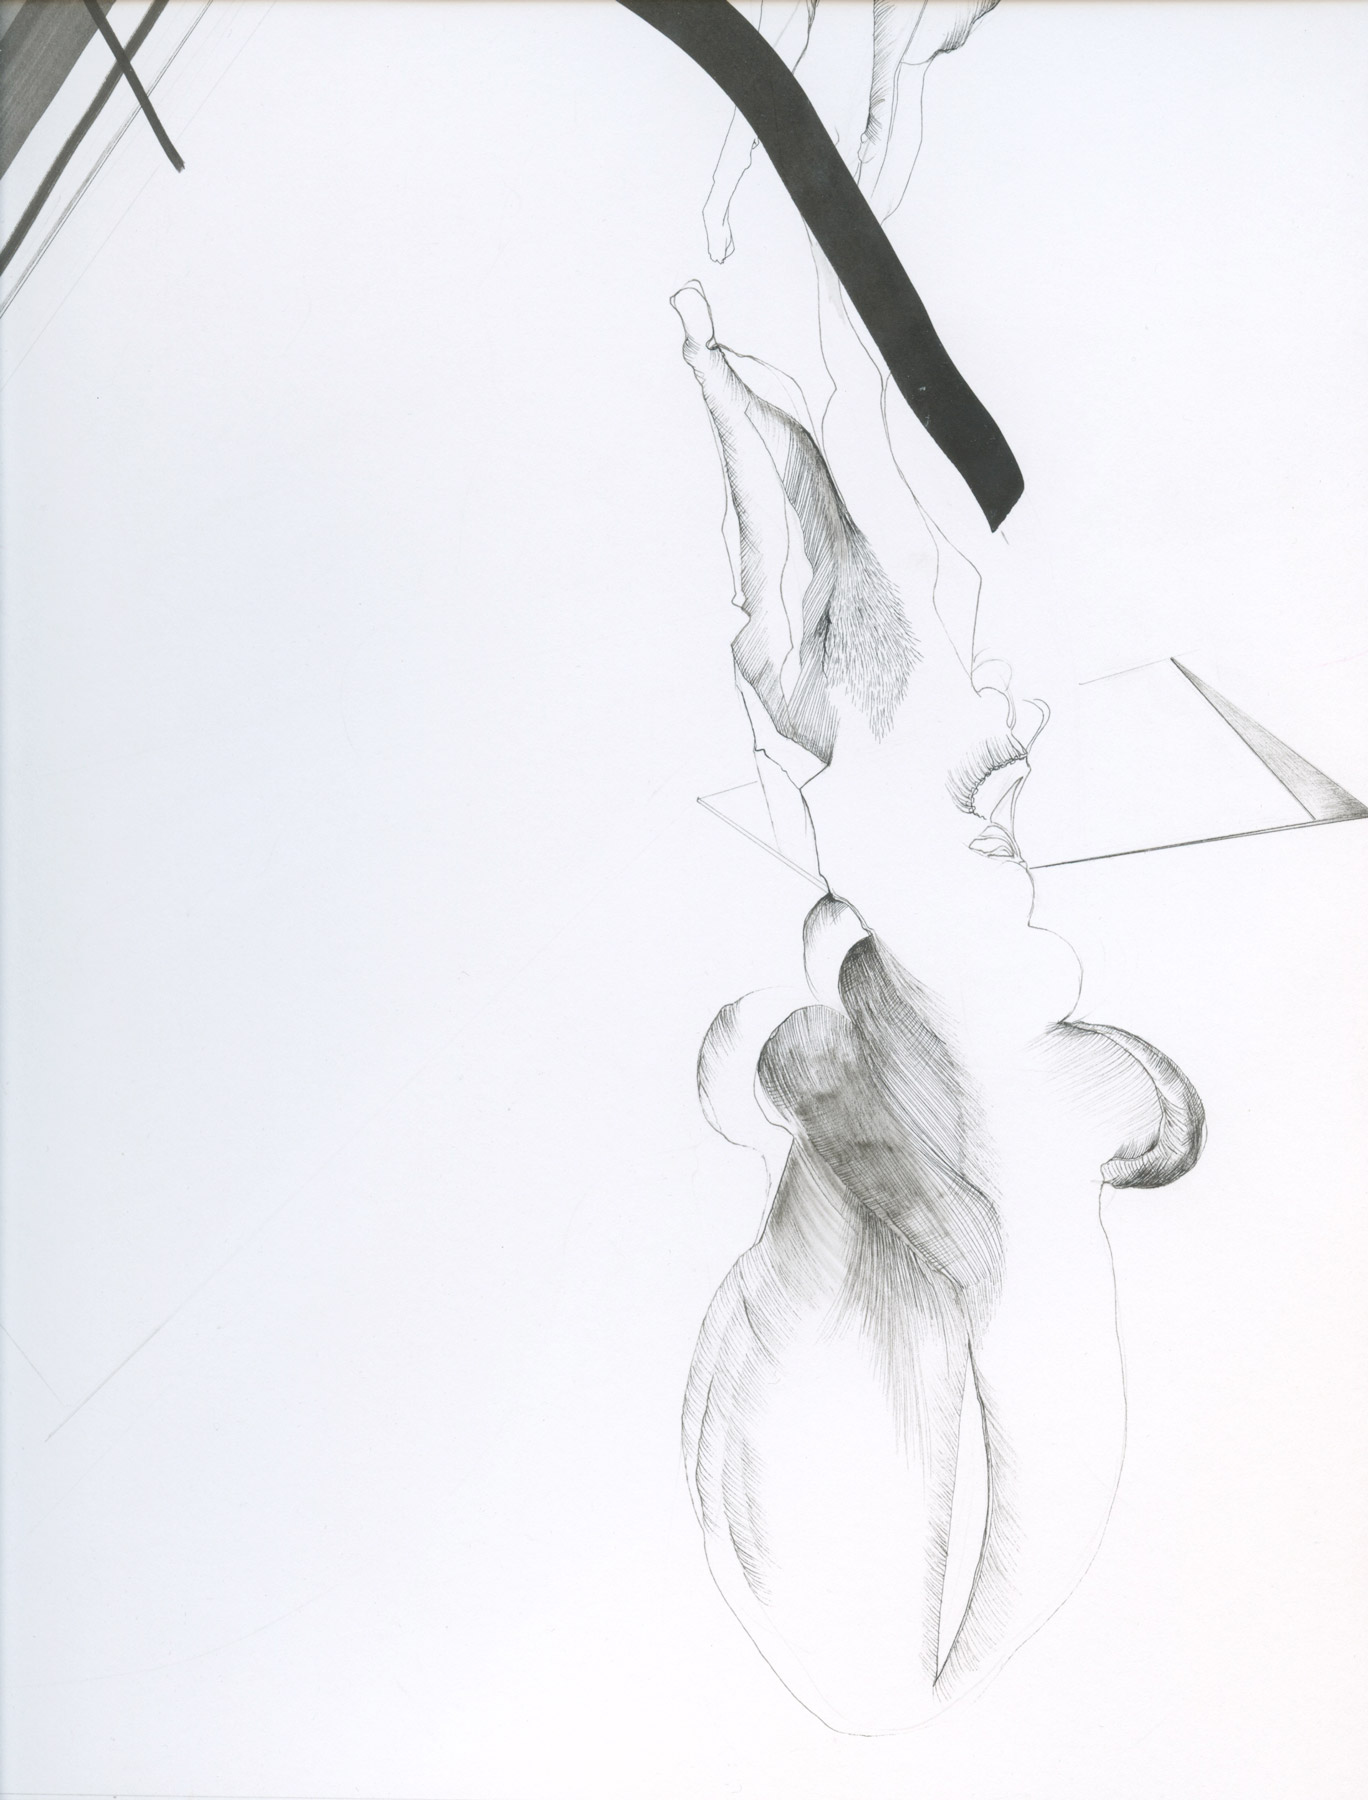 Nina Annabelle Märkl   Balancing the Whimsical 1   Ink on paper   65 x 40 cm   Detail